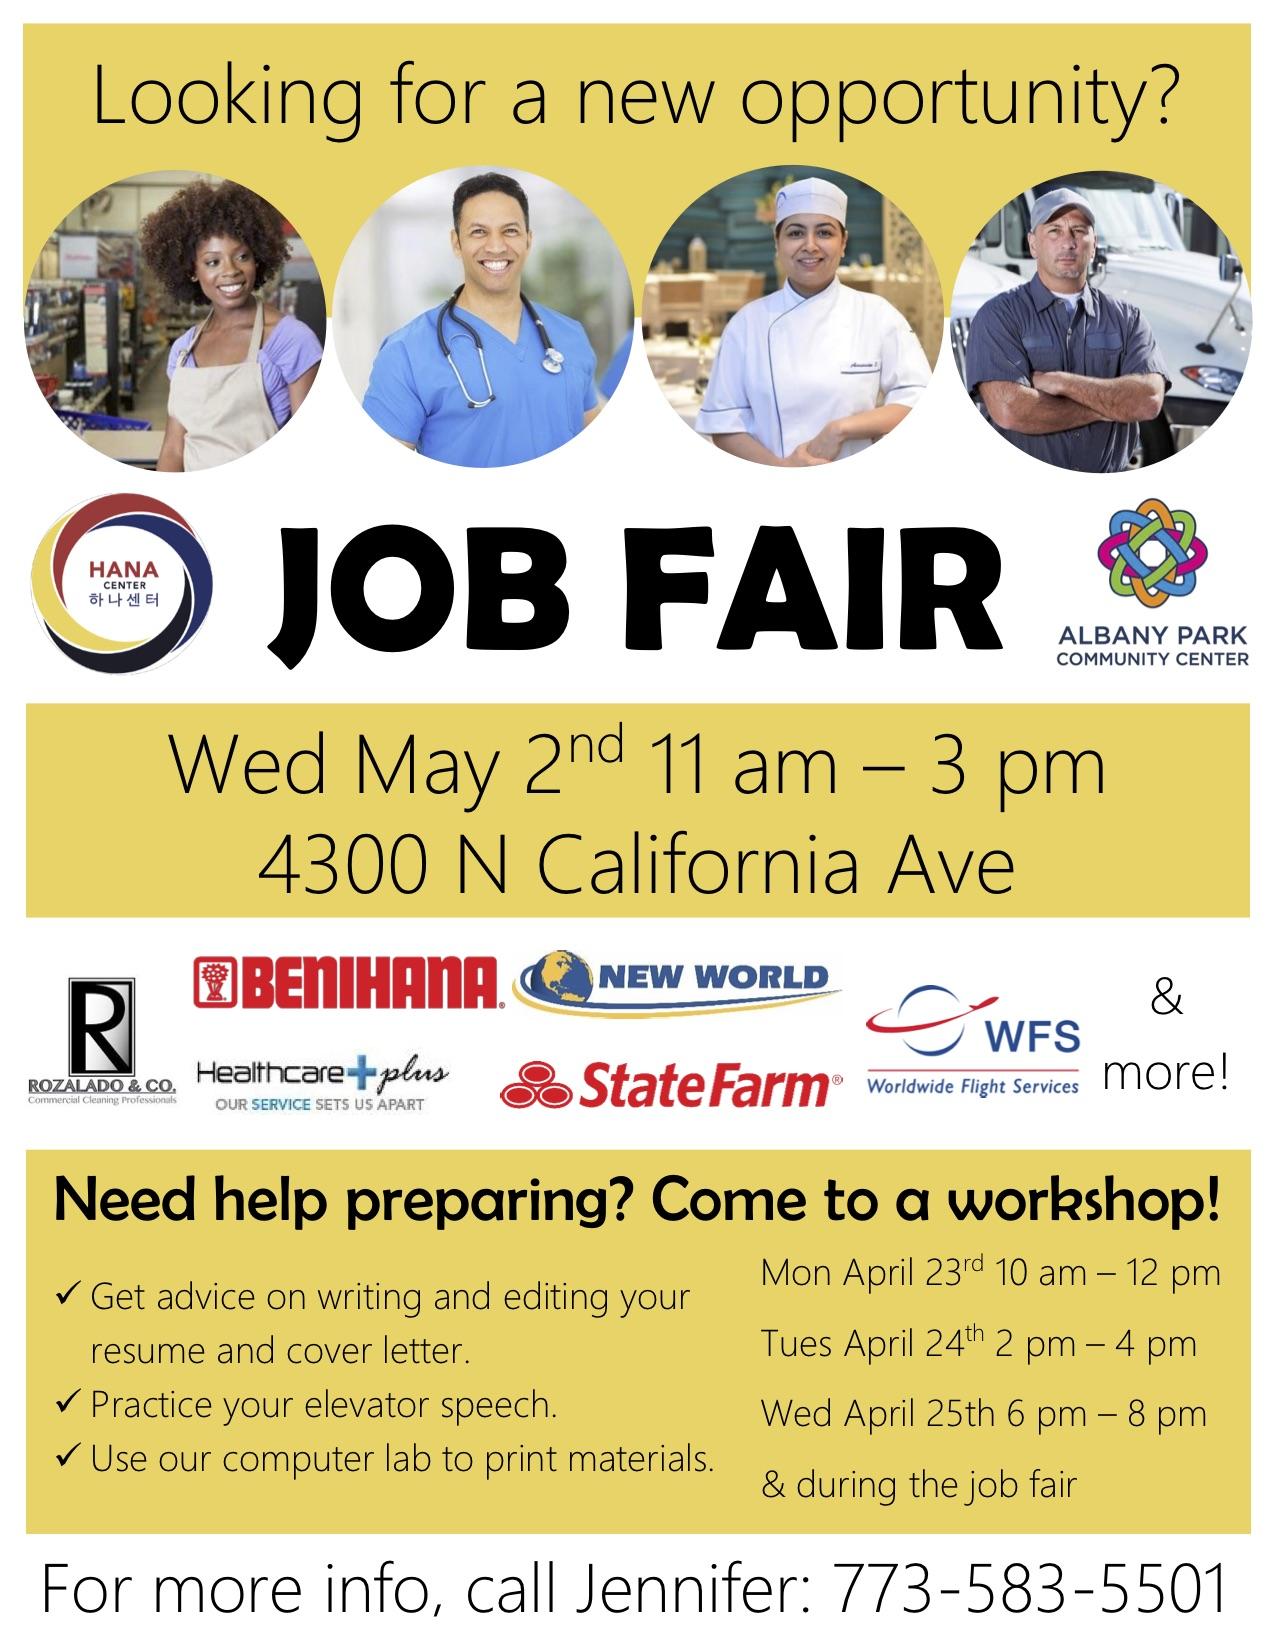 Job Fair Flyer 2018.jpg